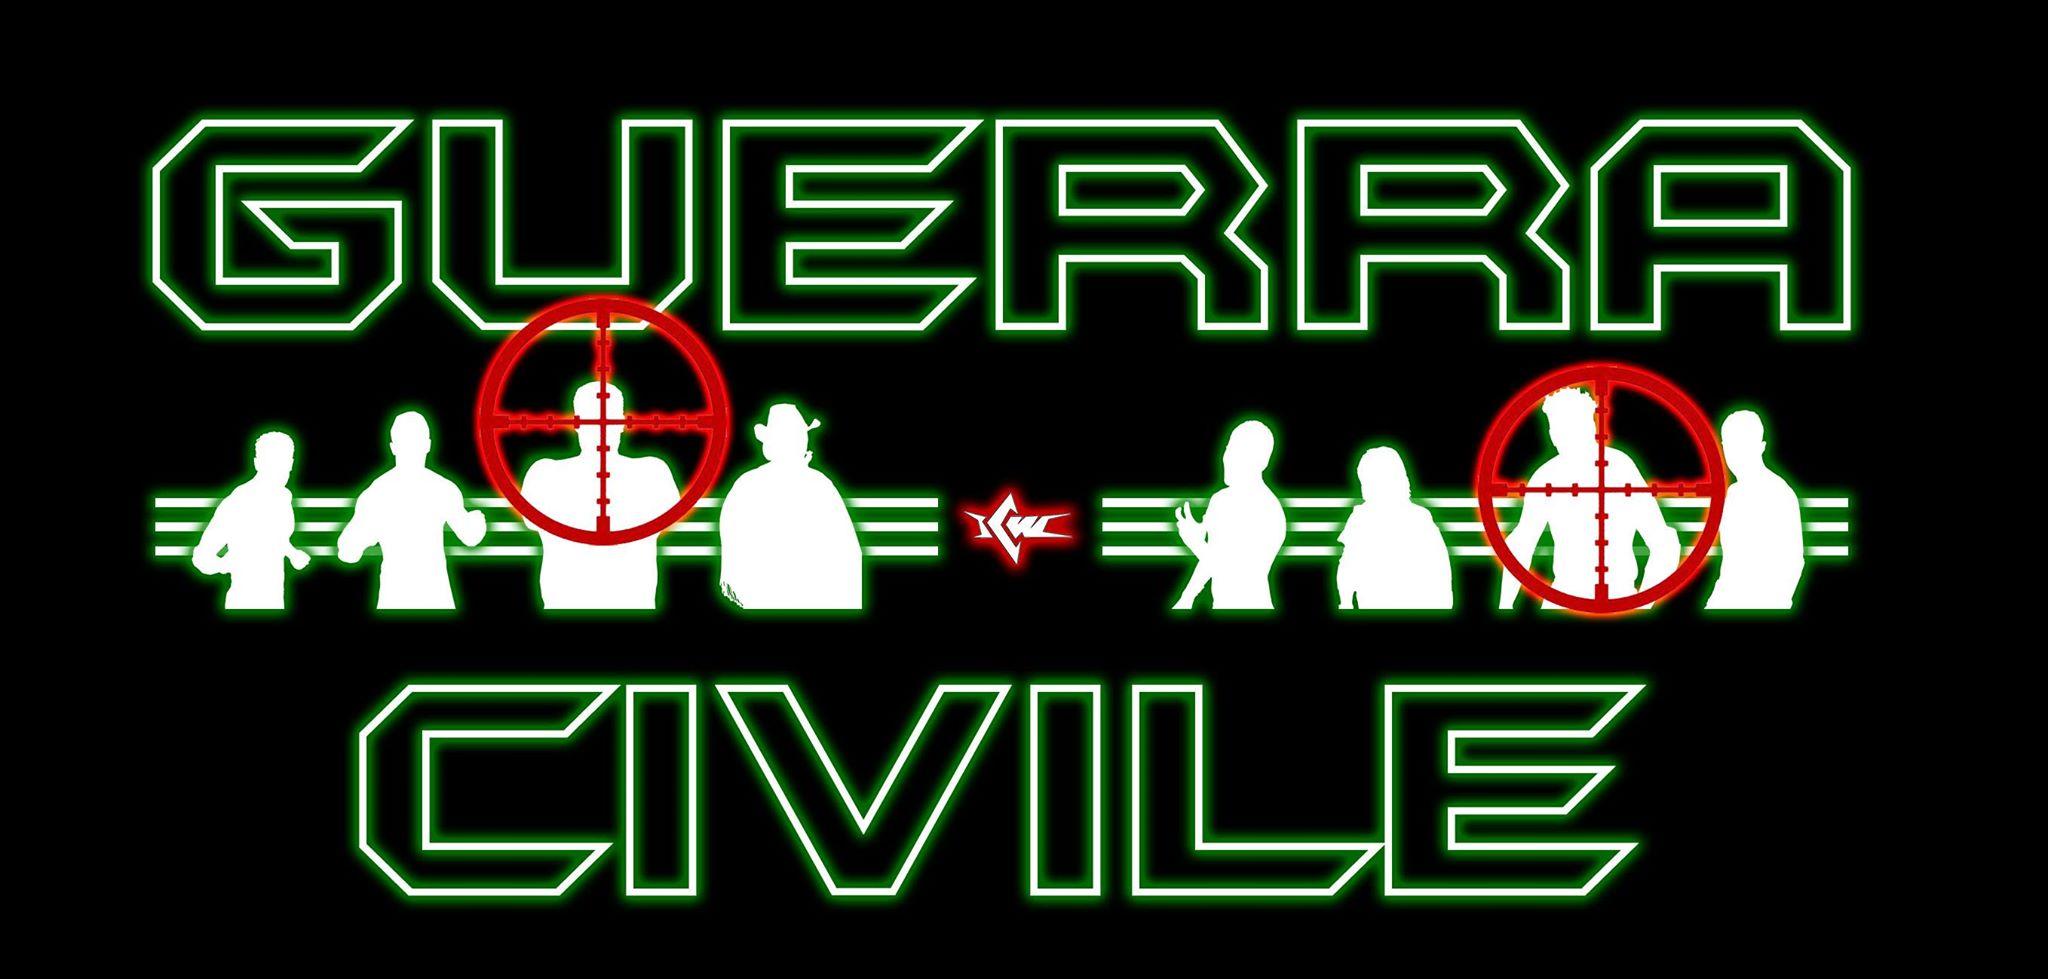 Guerra Civile 1b